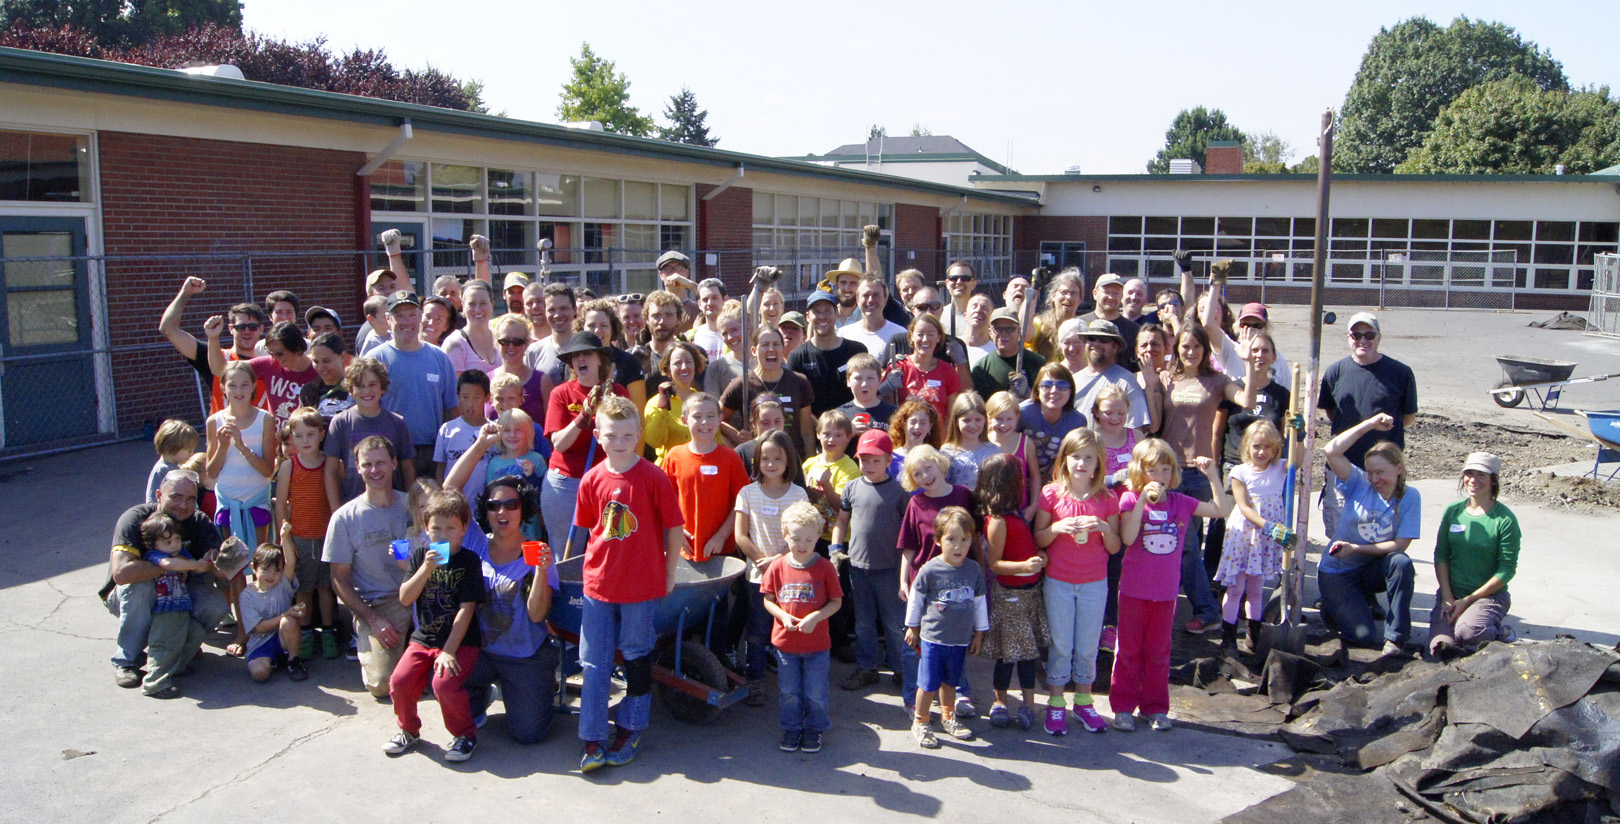 Lewis Elementary